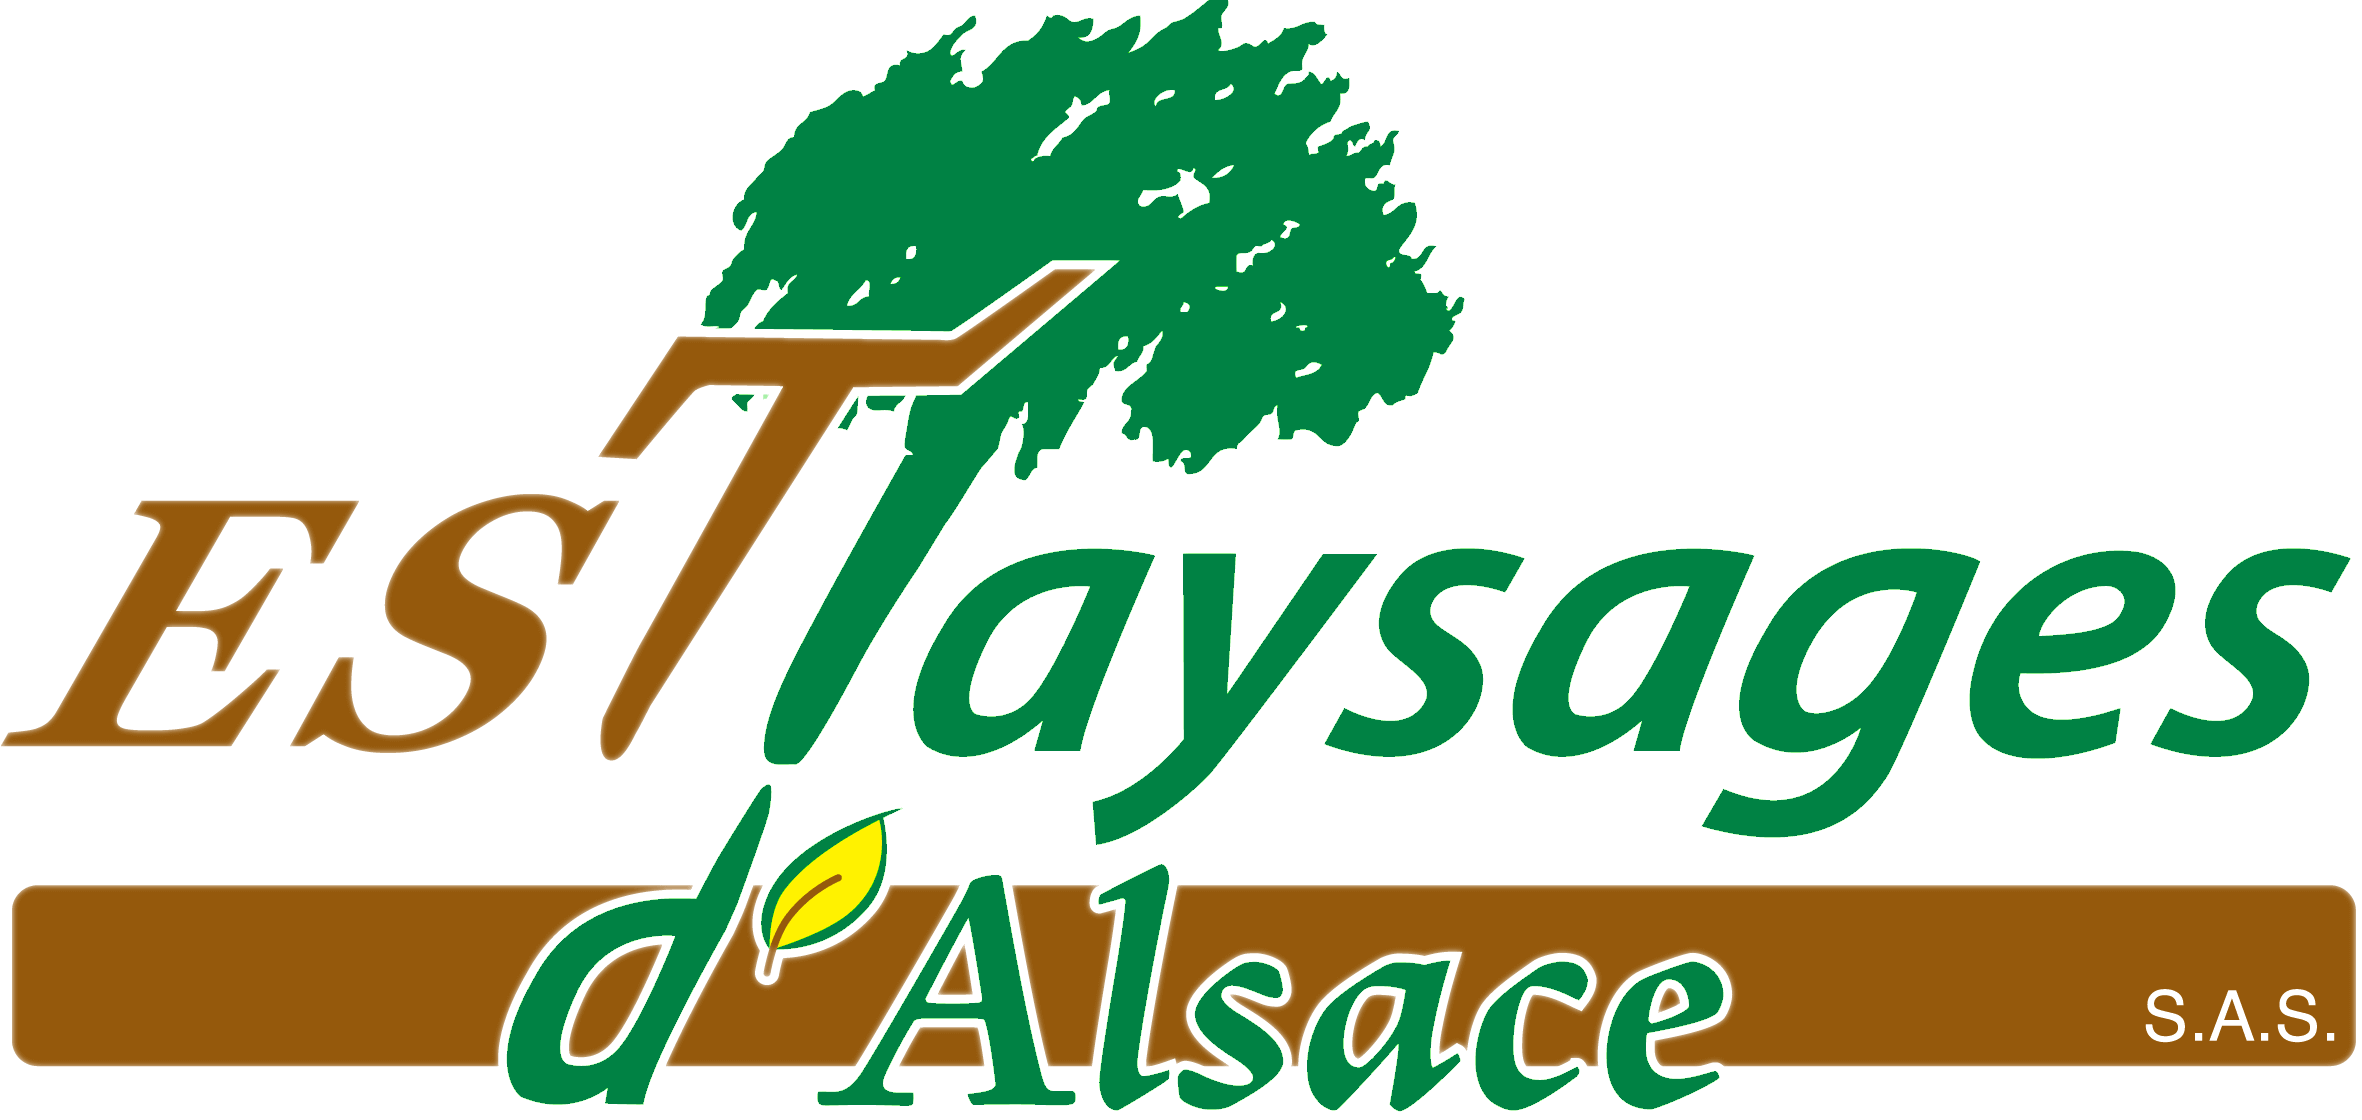 Paysagiste à Geispolsheim, Bas-Rhin - Est Paysages d'Alsace